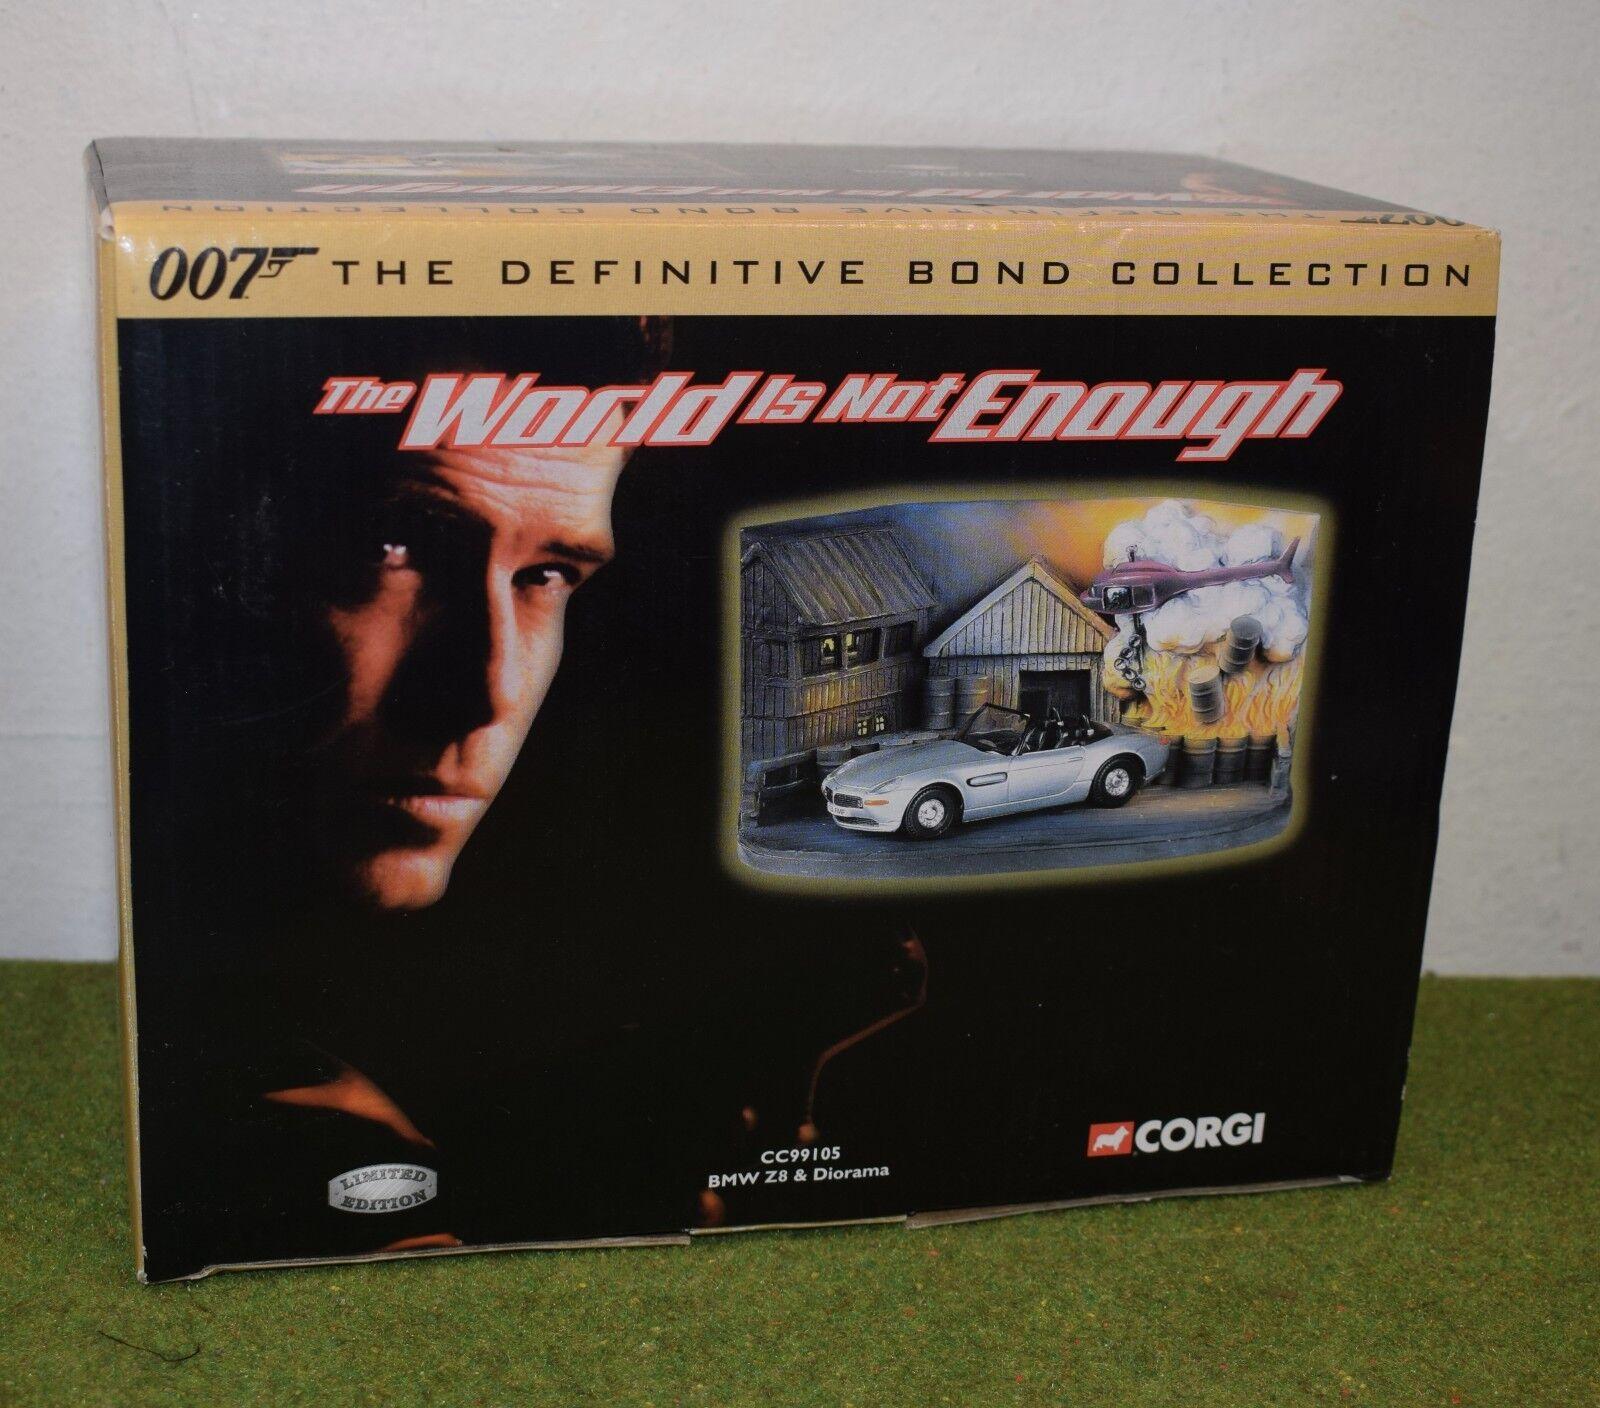 JAMES BOND 007 CORGI CC99105 BMW Z8 & DIORAMA THE WORLD IS NOT ENOUGH